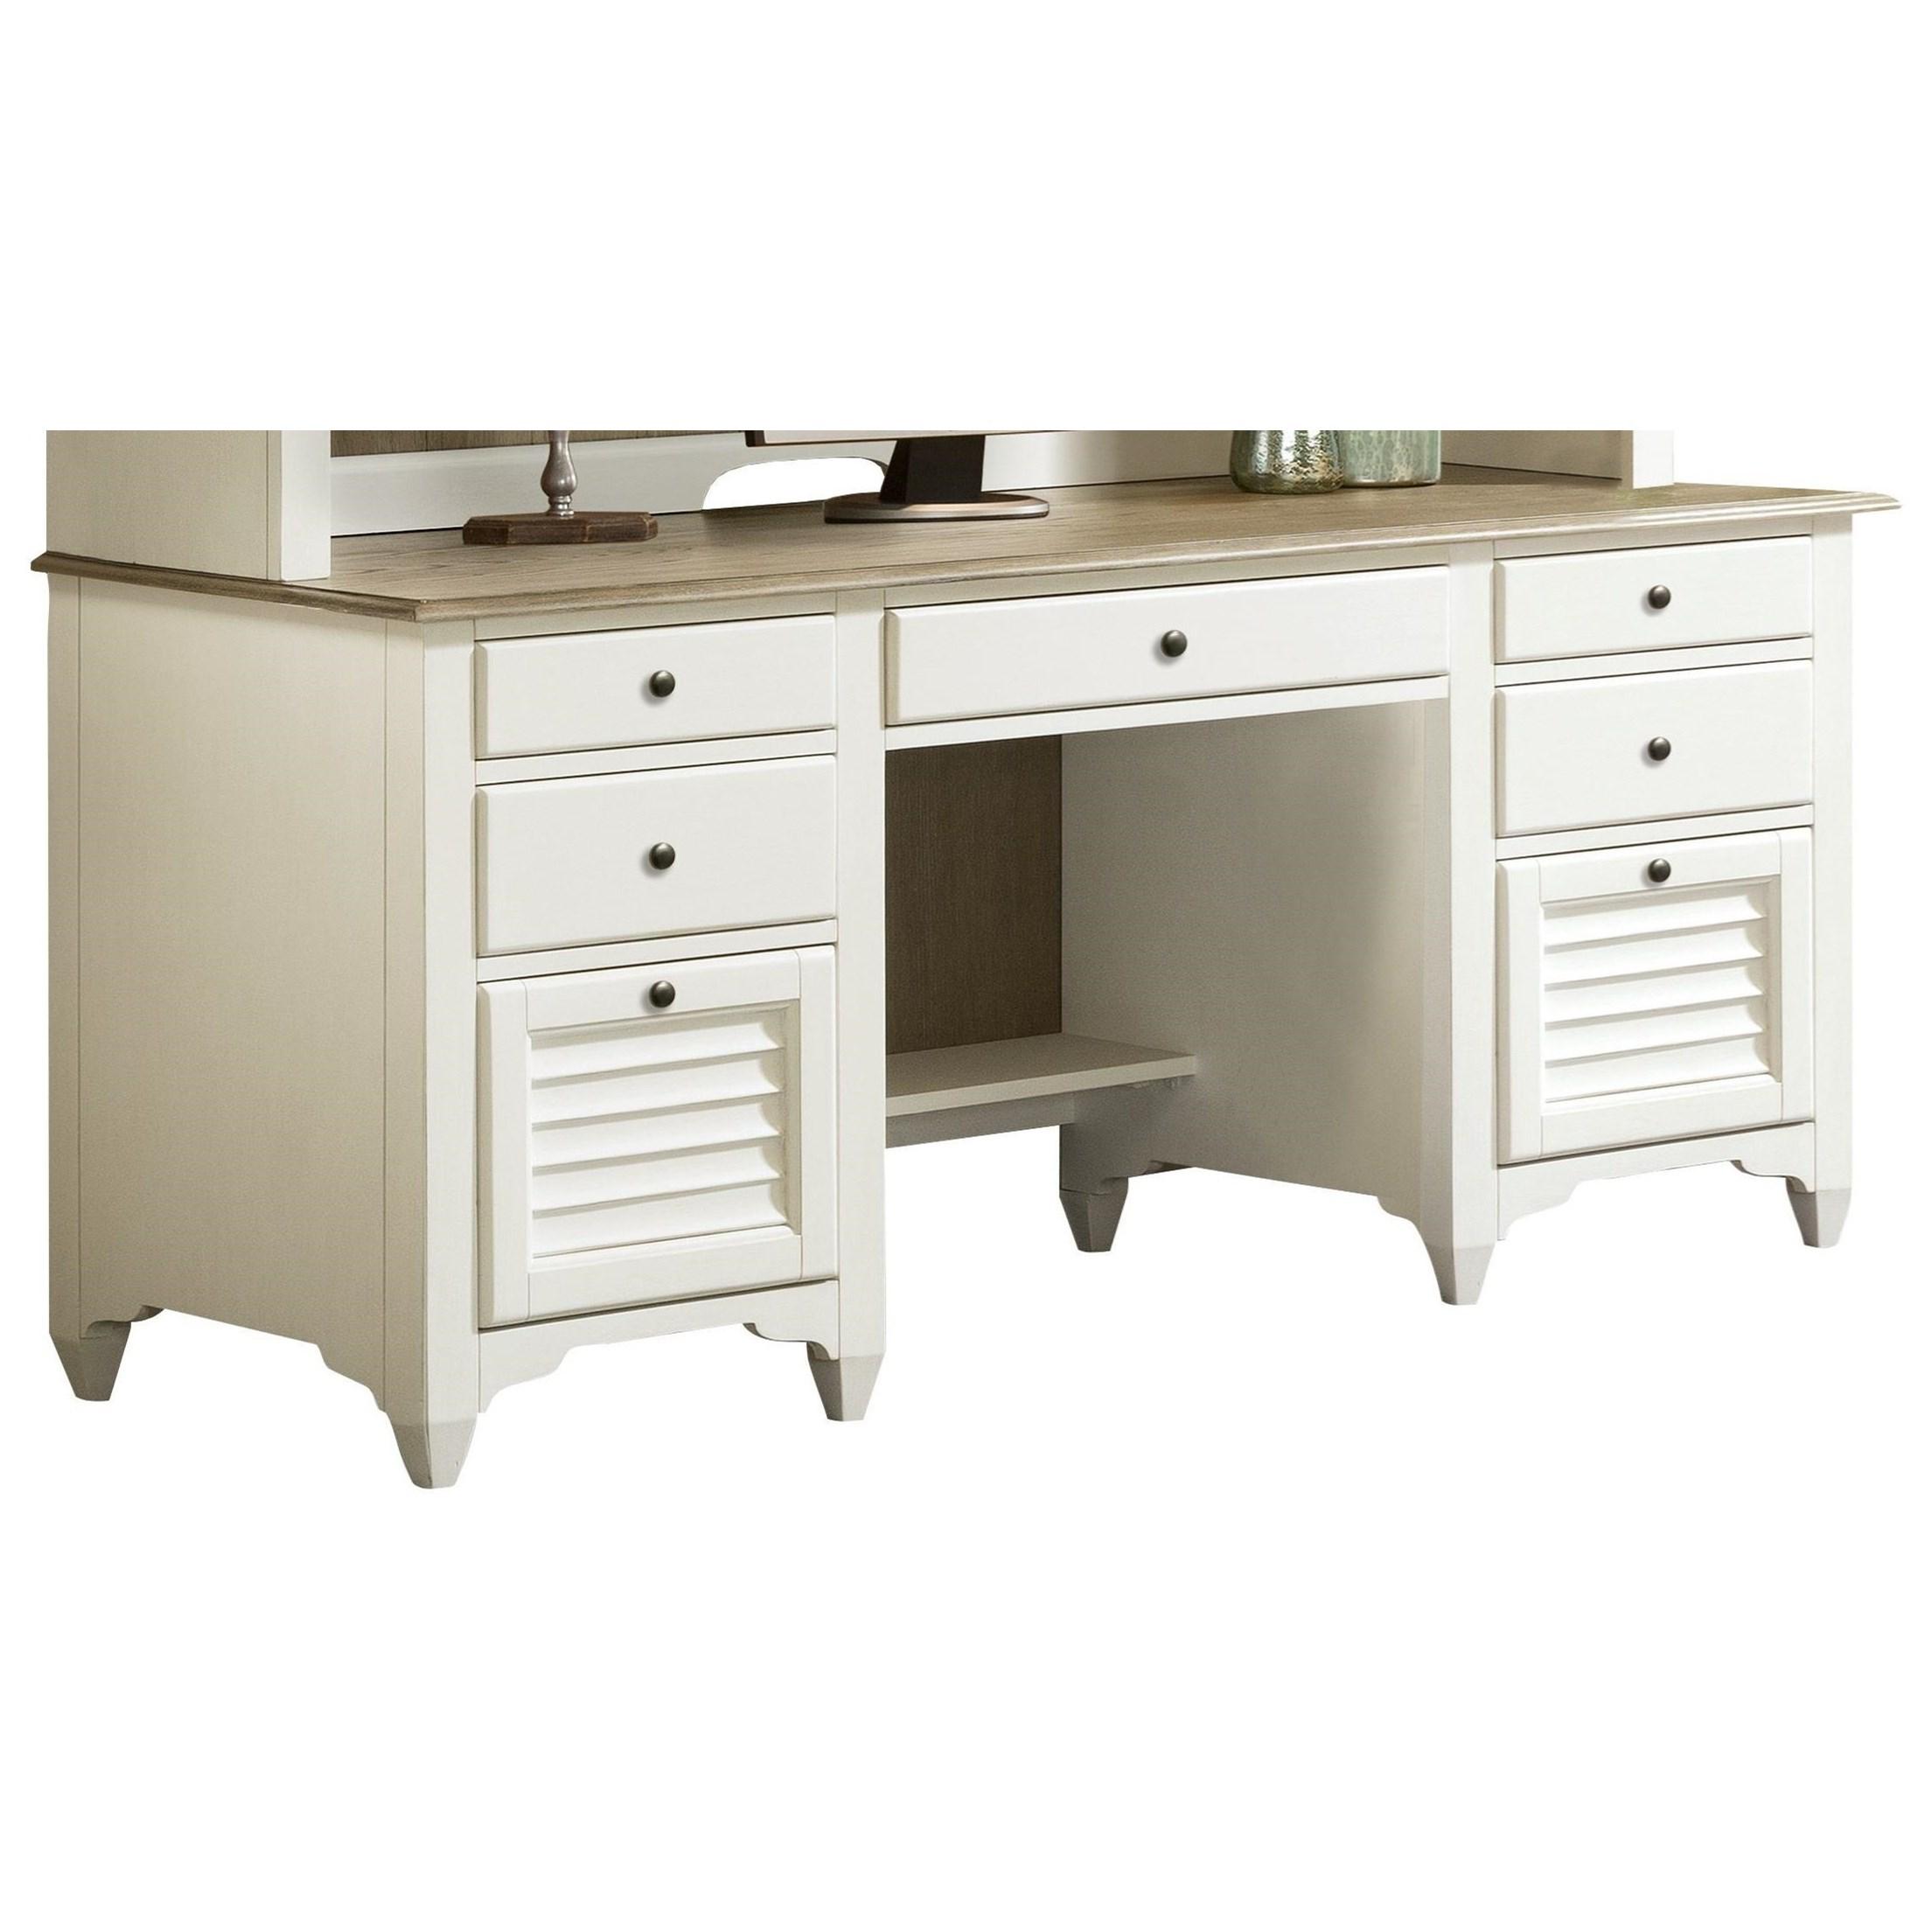 Myra Credenza Desk by Riverside Furniture at Johnny Janosik